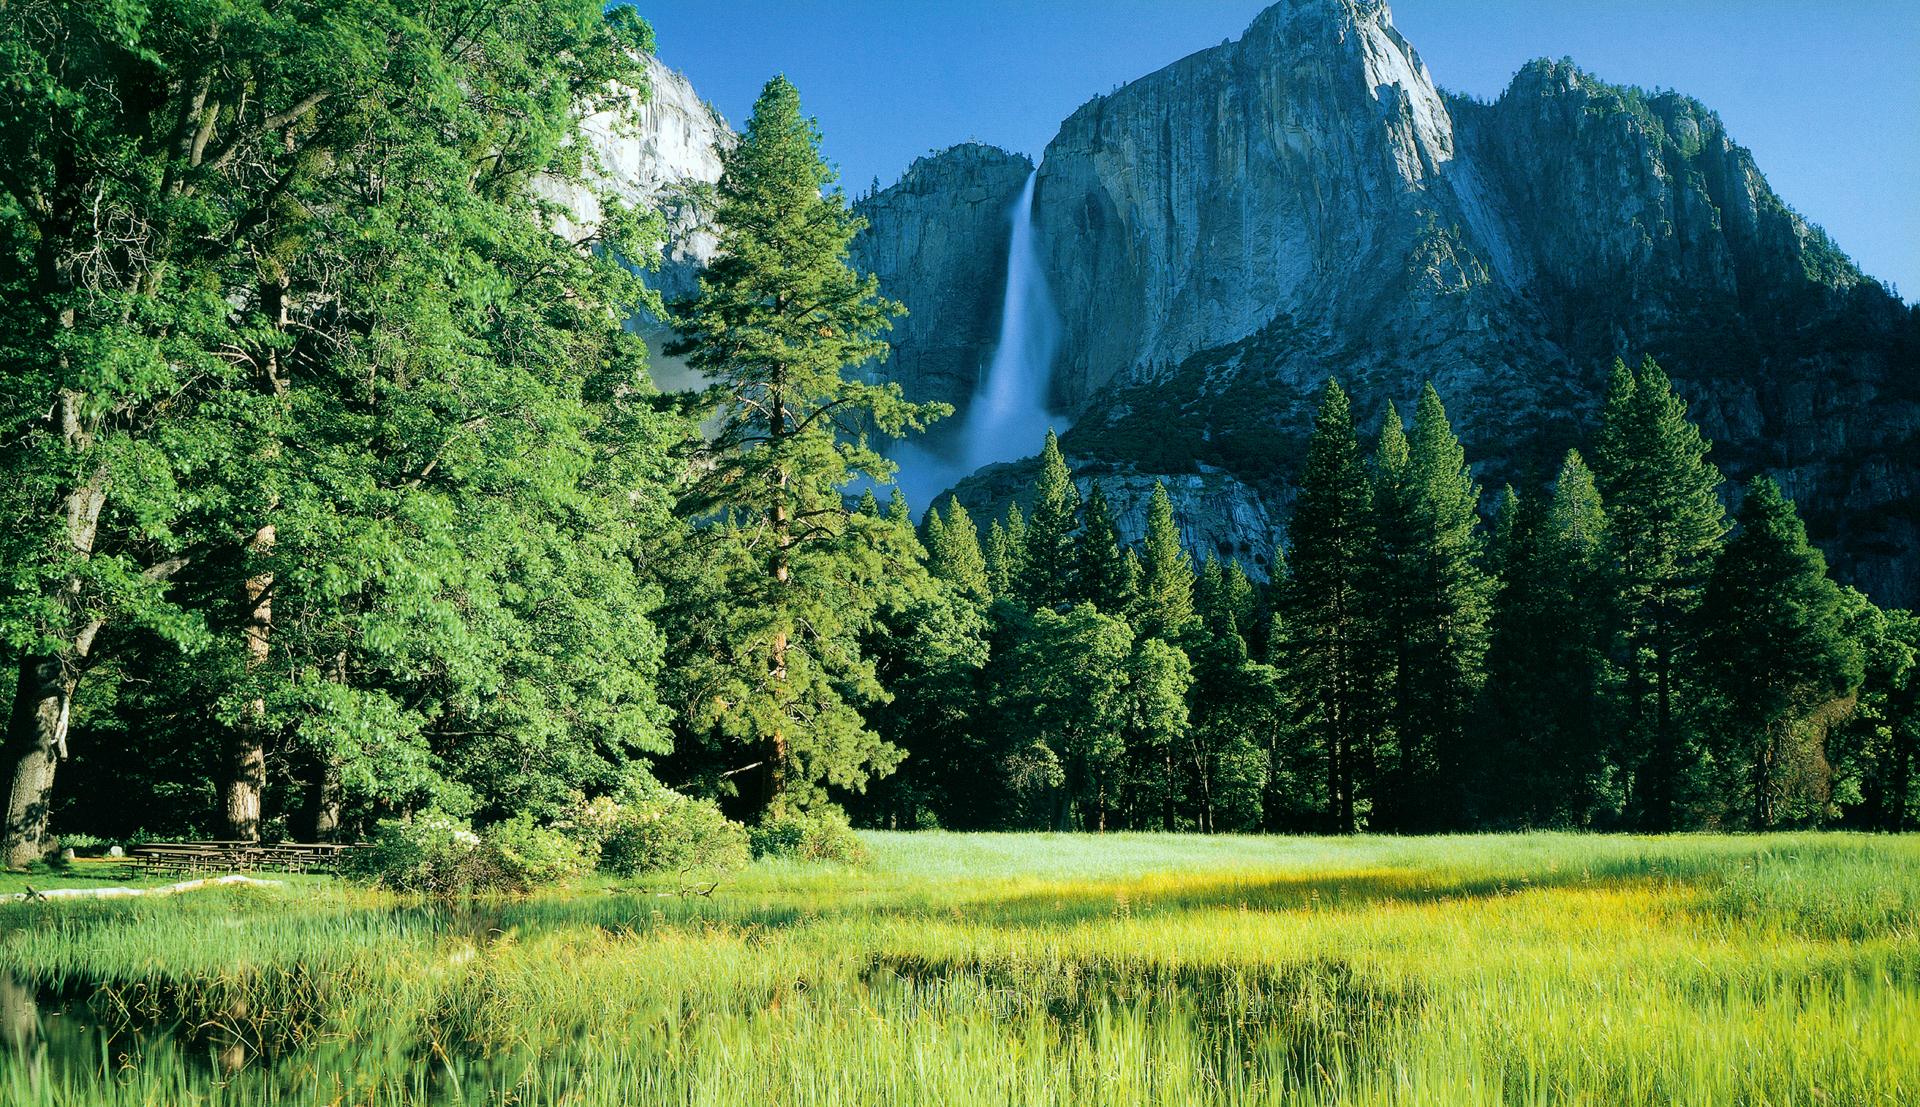 Green Yosemite National Park Muntain Wallpapers HD 1920x1107